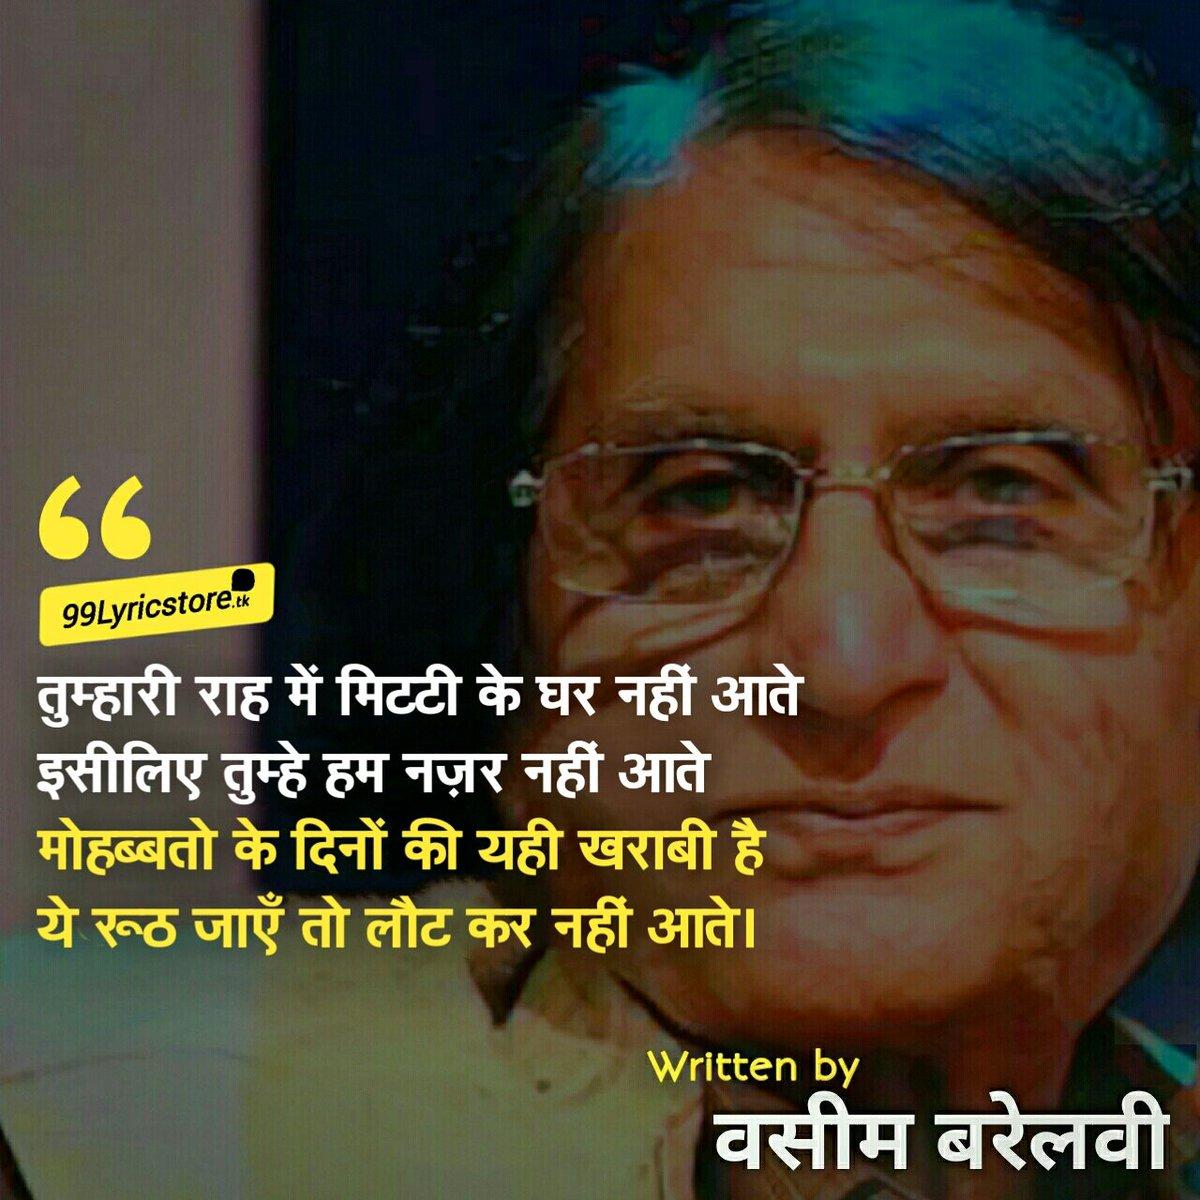 Bure Zamane Kabhi Poochh Kar Nahi Aate' written by Waseem Barelvi. This poetry is best Ghazal and Shayari of Waseem Barelvi.